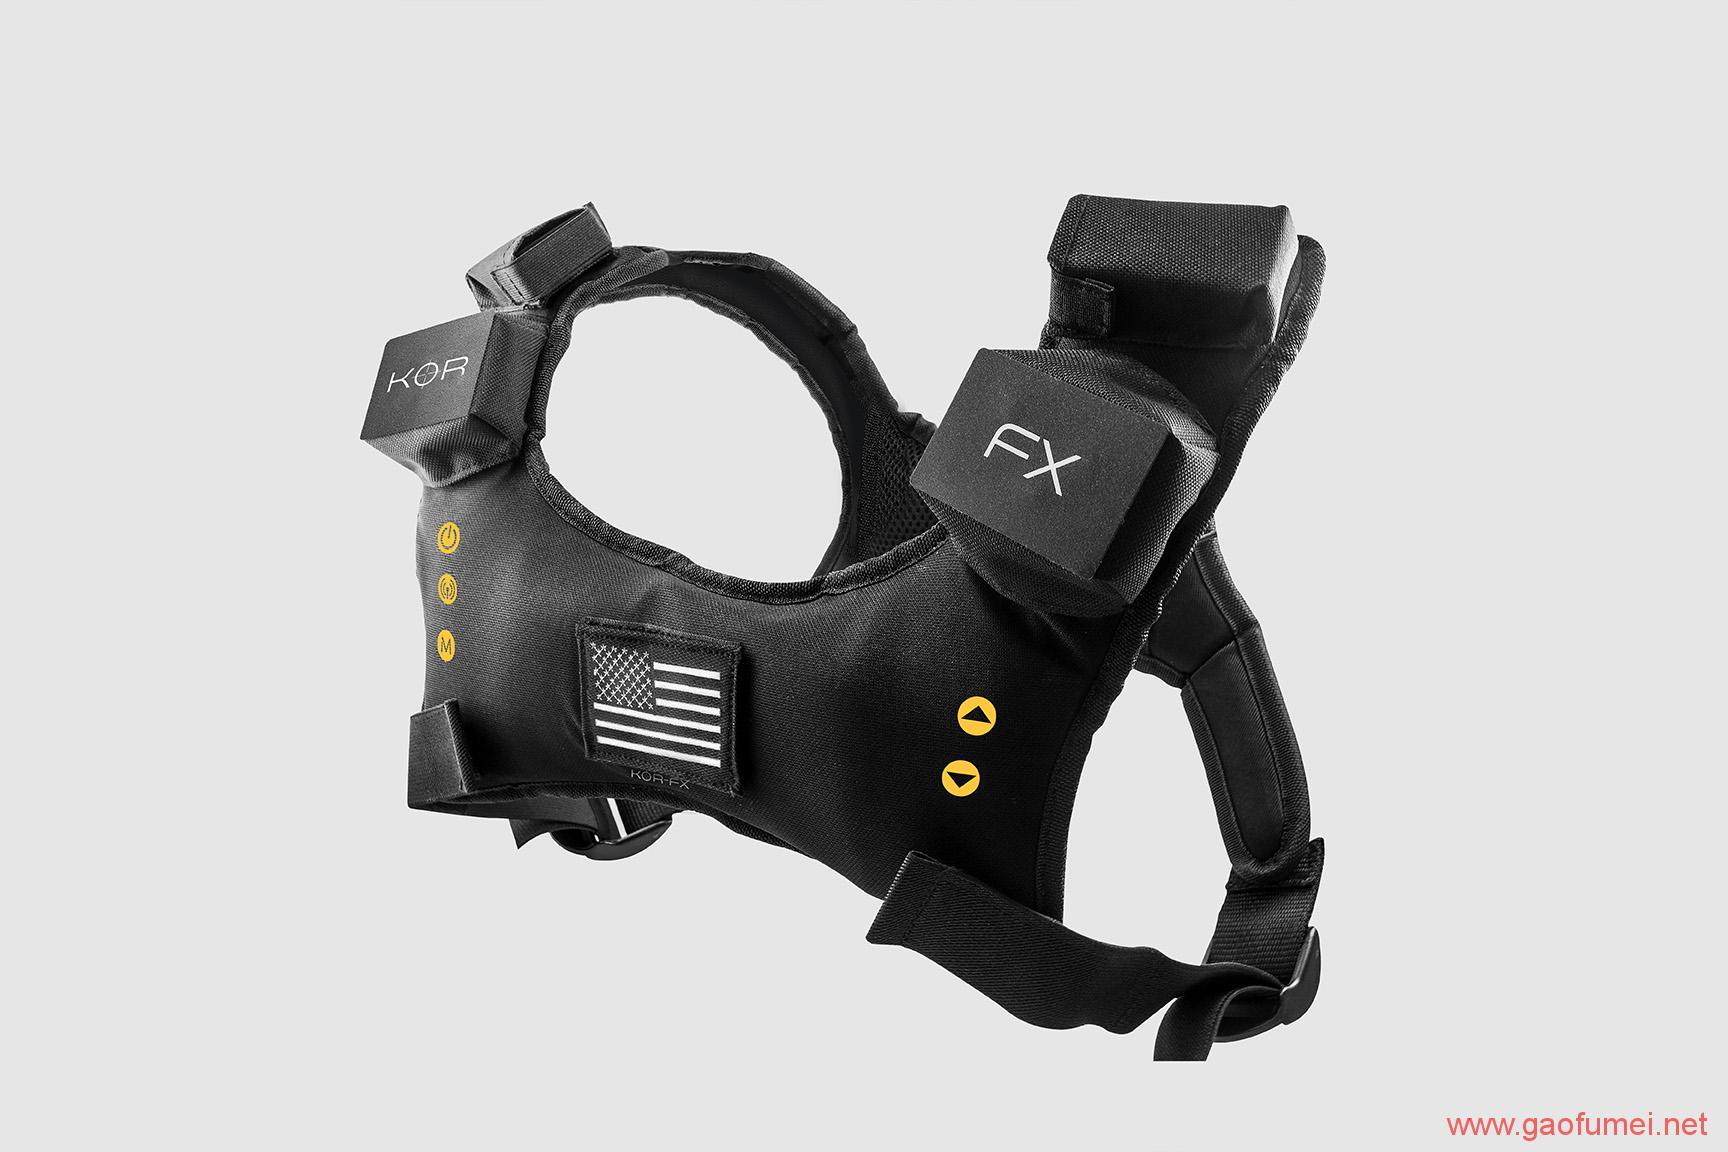 Tegway让你感受VR的温度VR外设百花齐放 虚拟现实 第5张-泥人传说